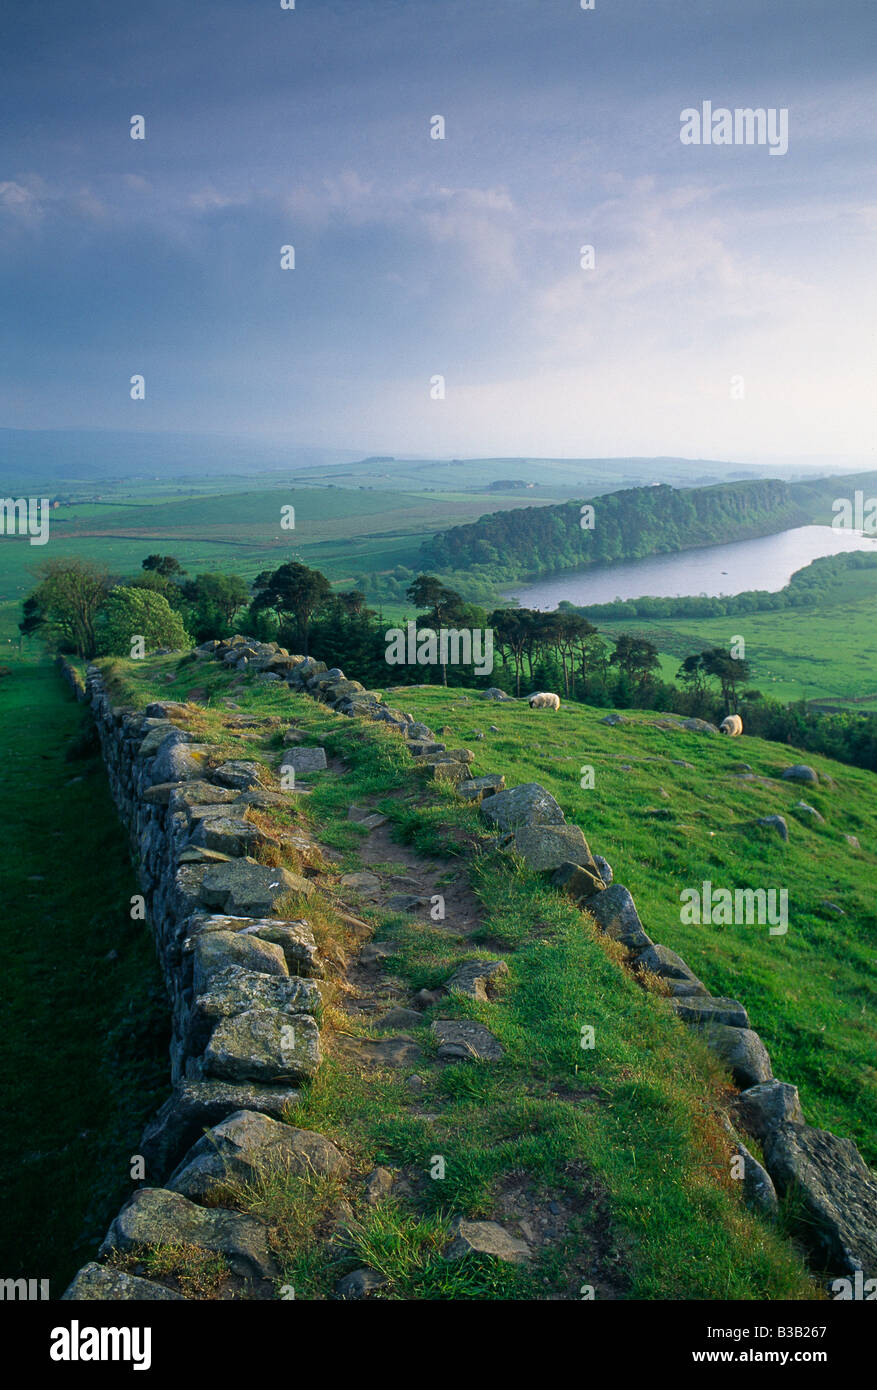 Hadrian's Wall at Hotbank, nr Housesteads, Northumberland, England, UK - Stock Image